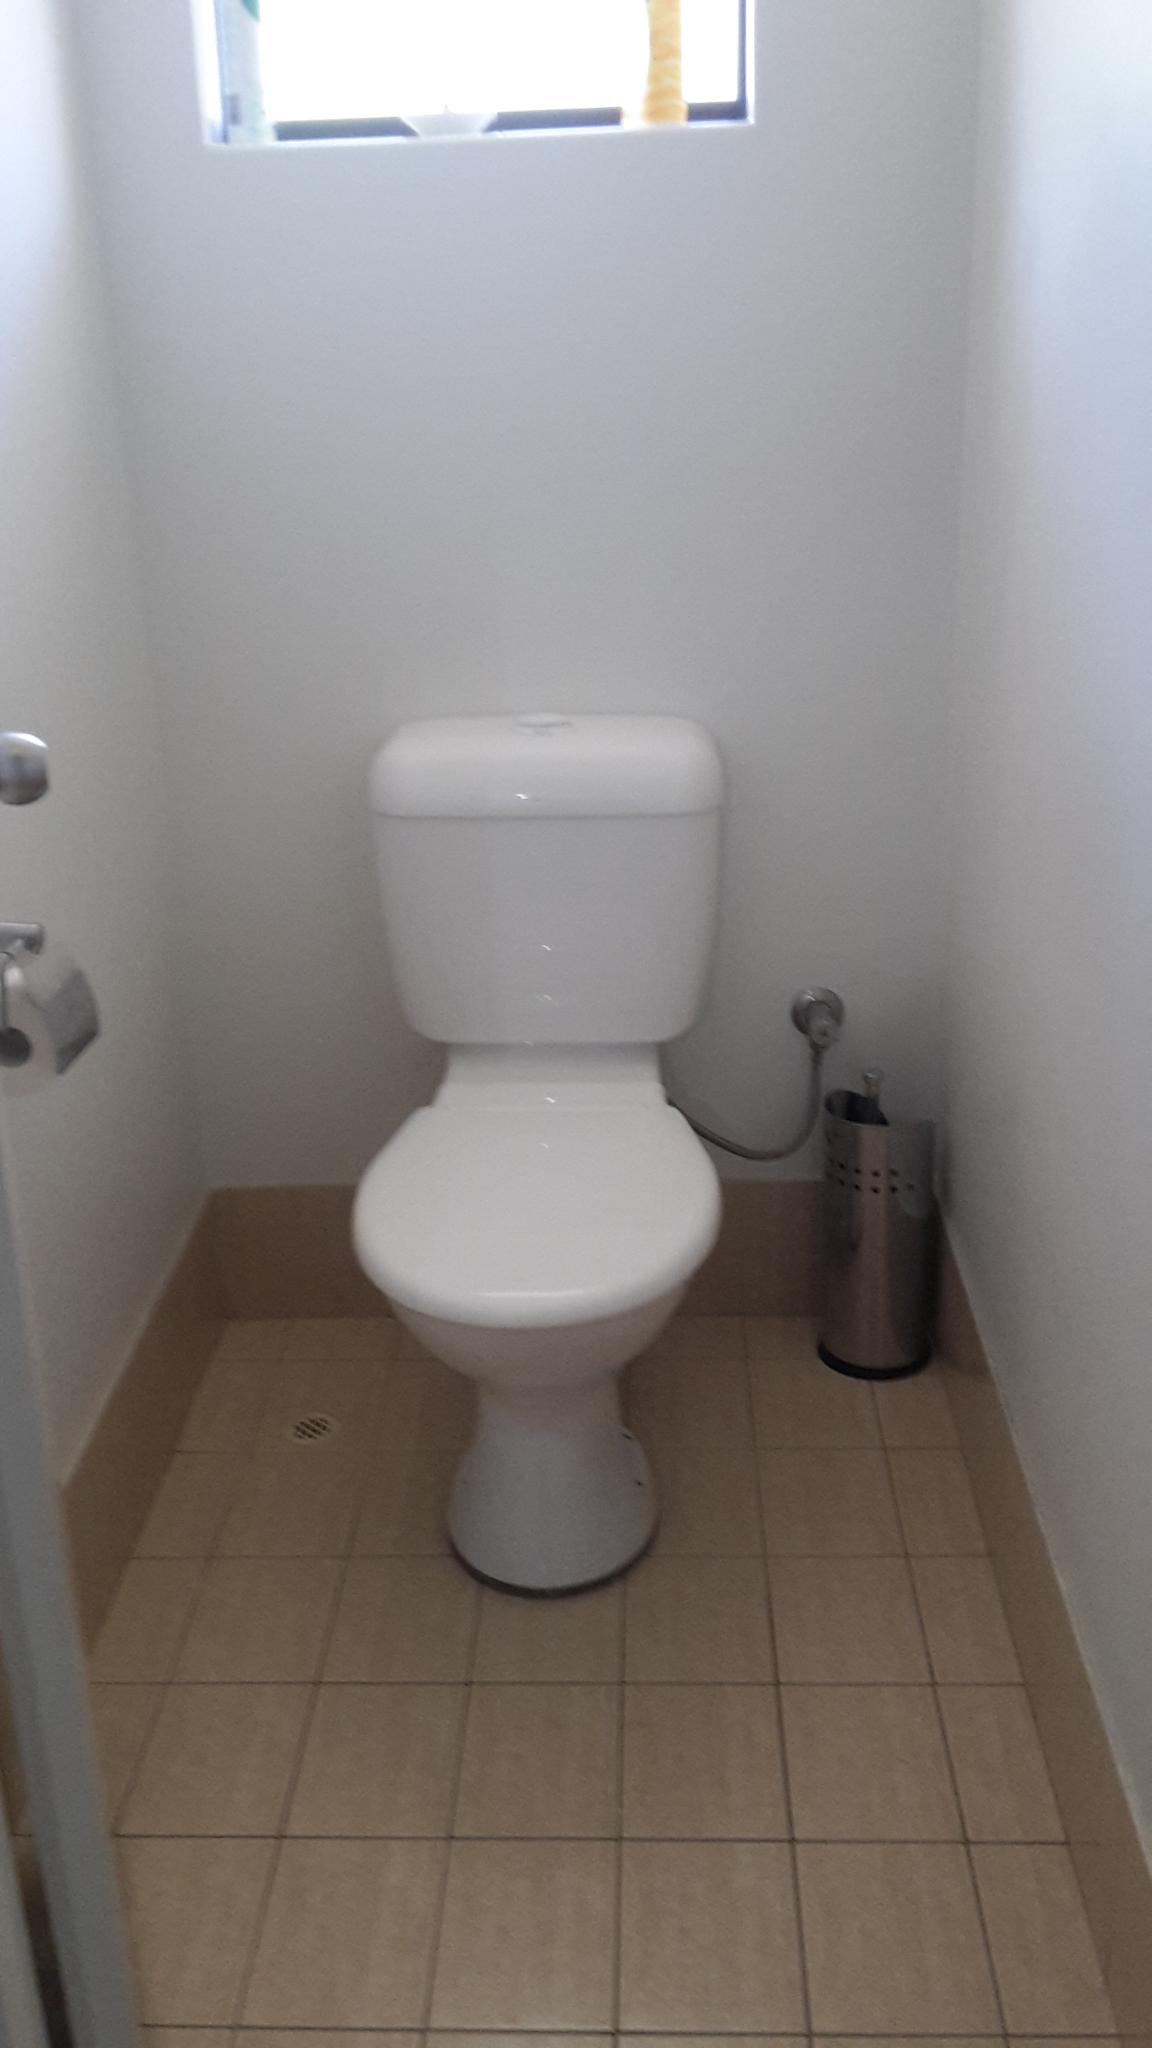 Before Toilet / Bathroom Renovation